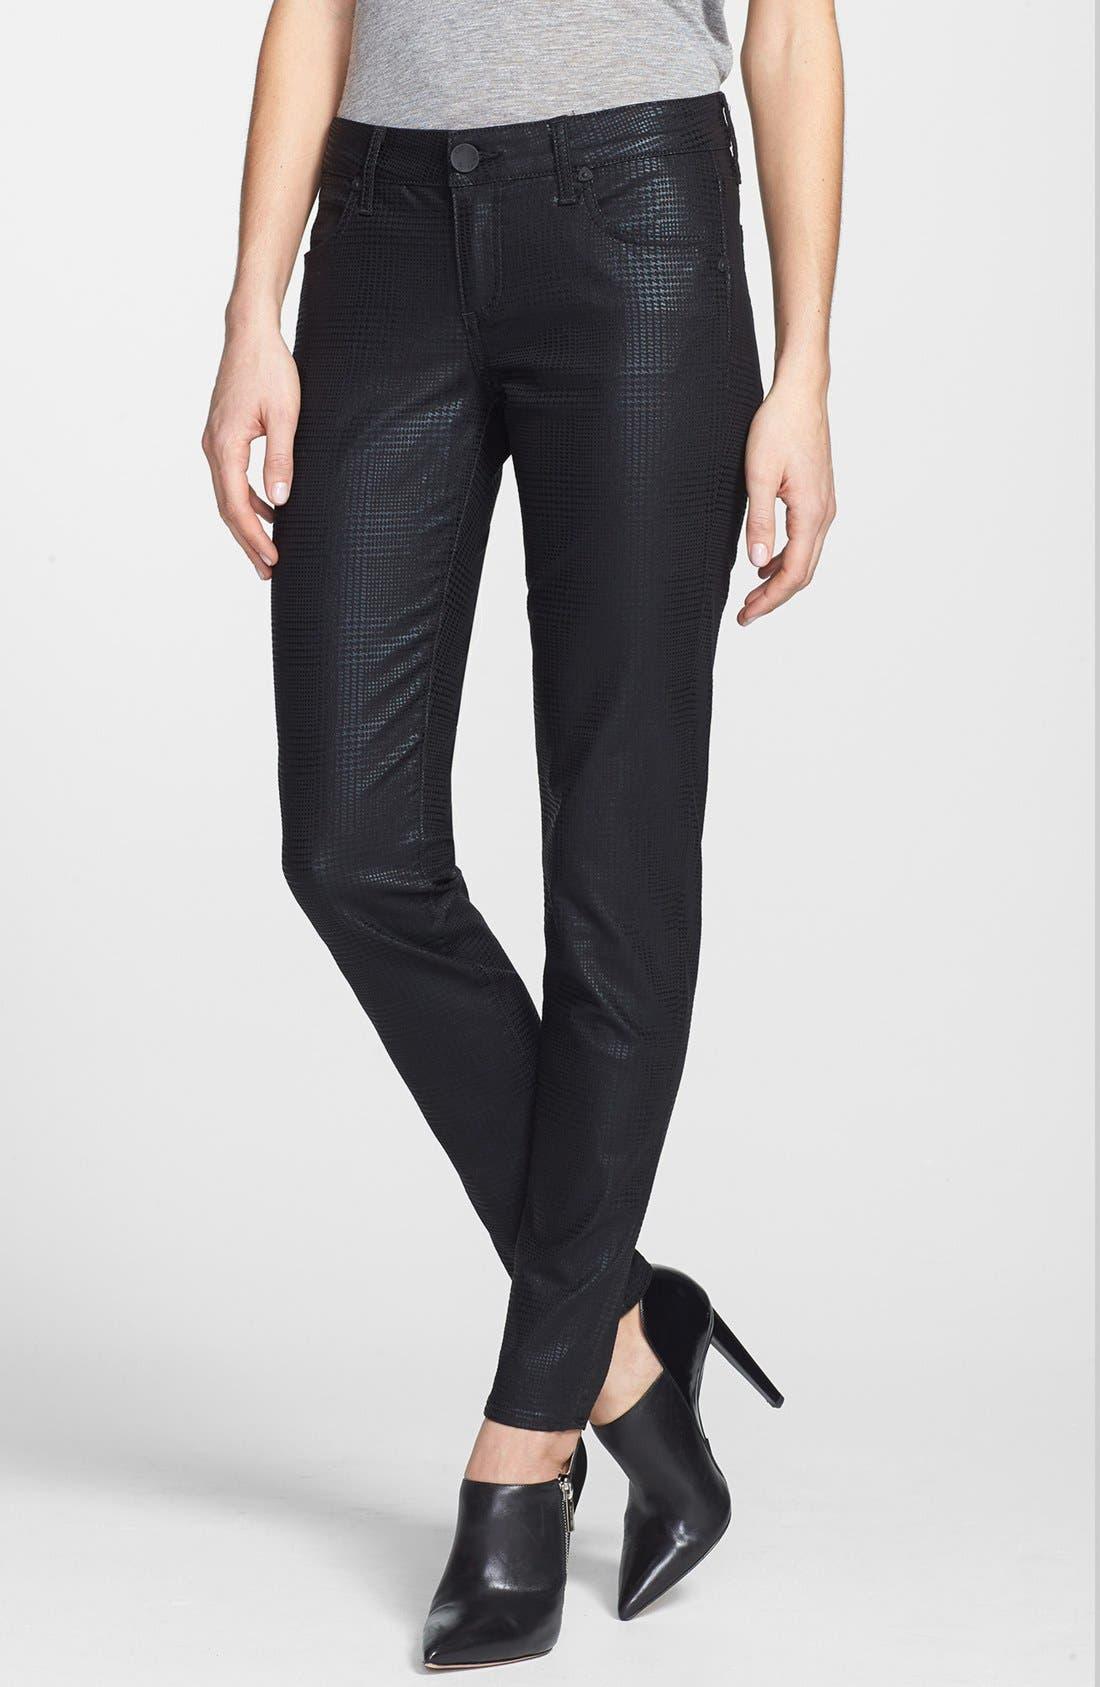 Main Image - KUT from the Kloth 'Mia' Toothpick Skinny Jeans (Black)